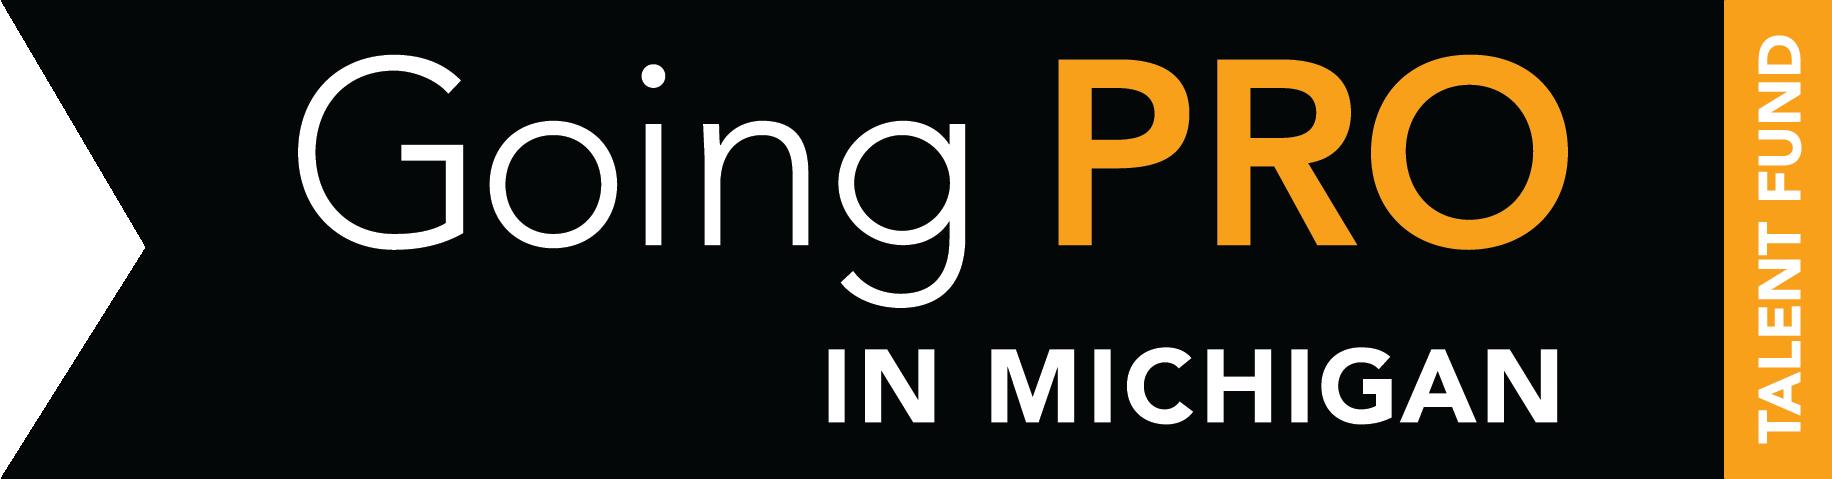 goingproinmi_talent_fund_logo-01